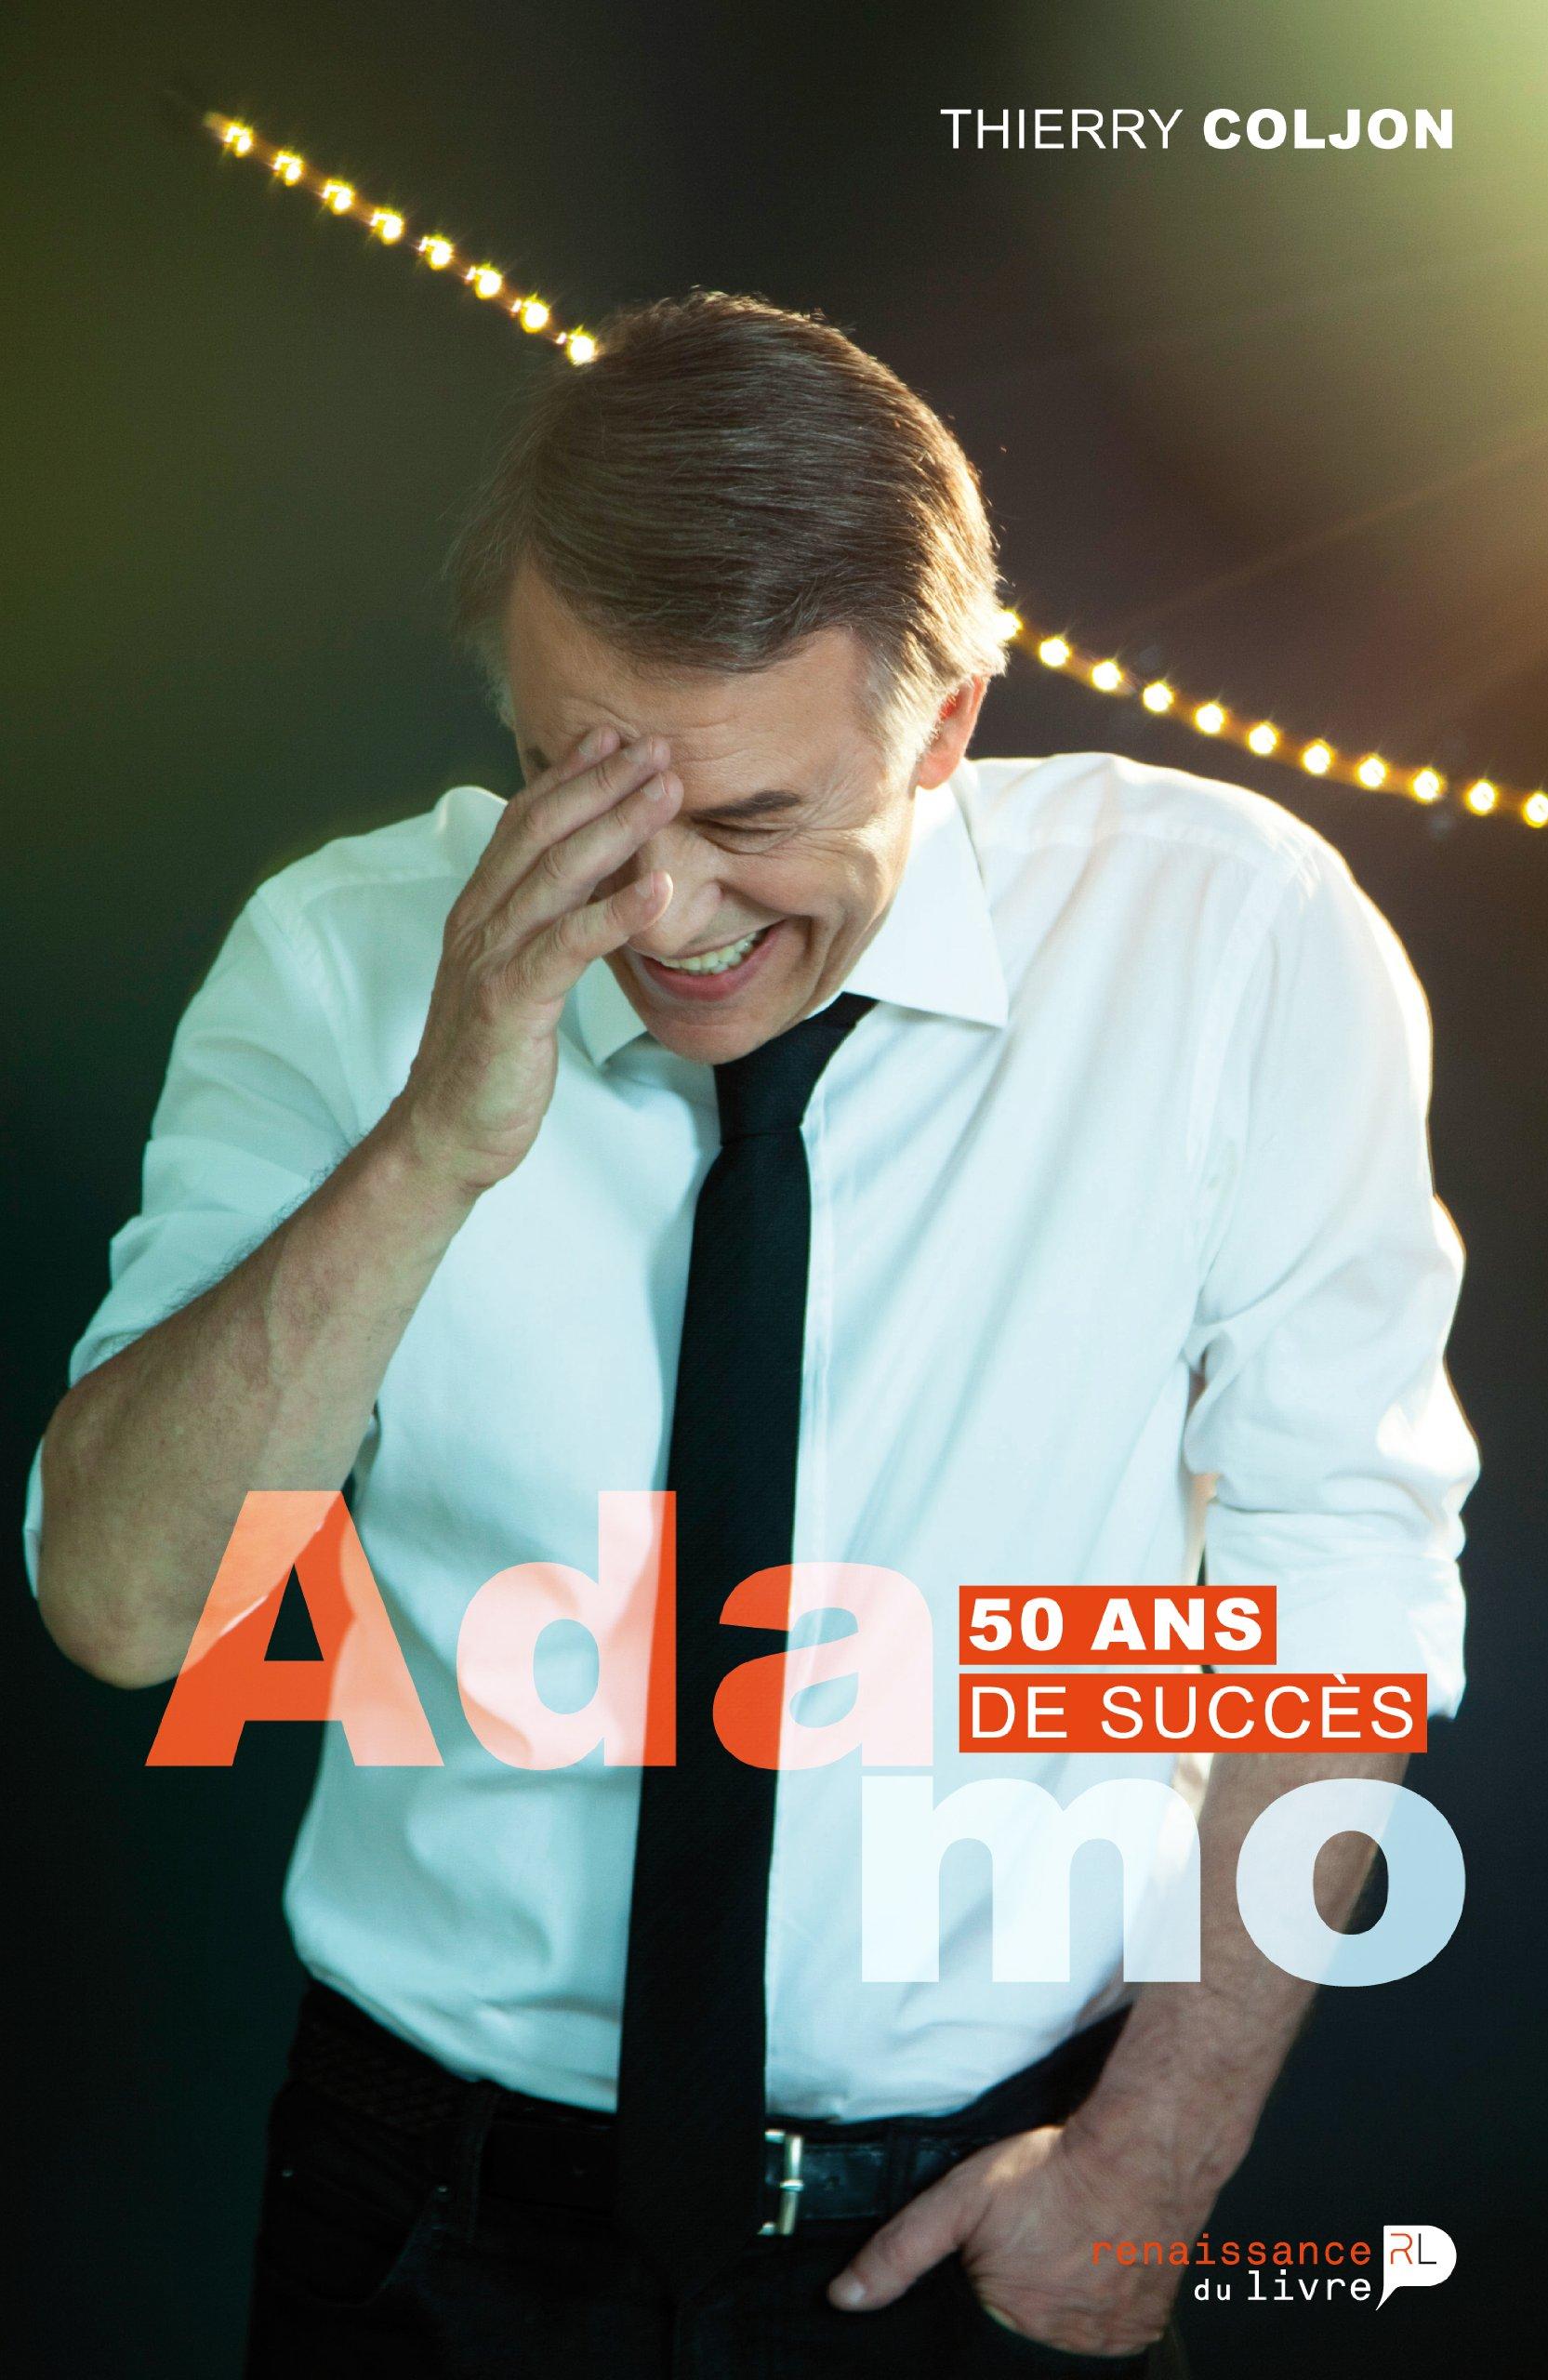 Salvatore Adamo, 50 ans de succès